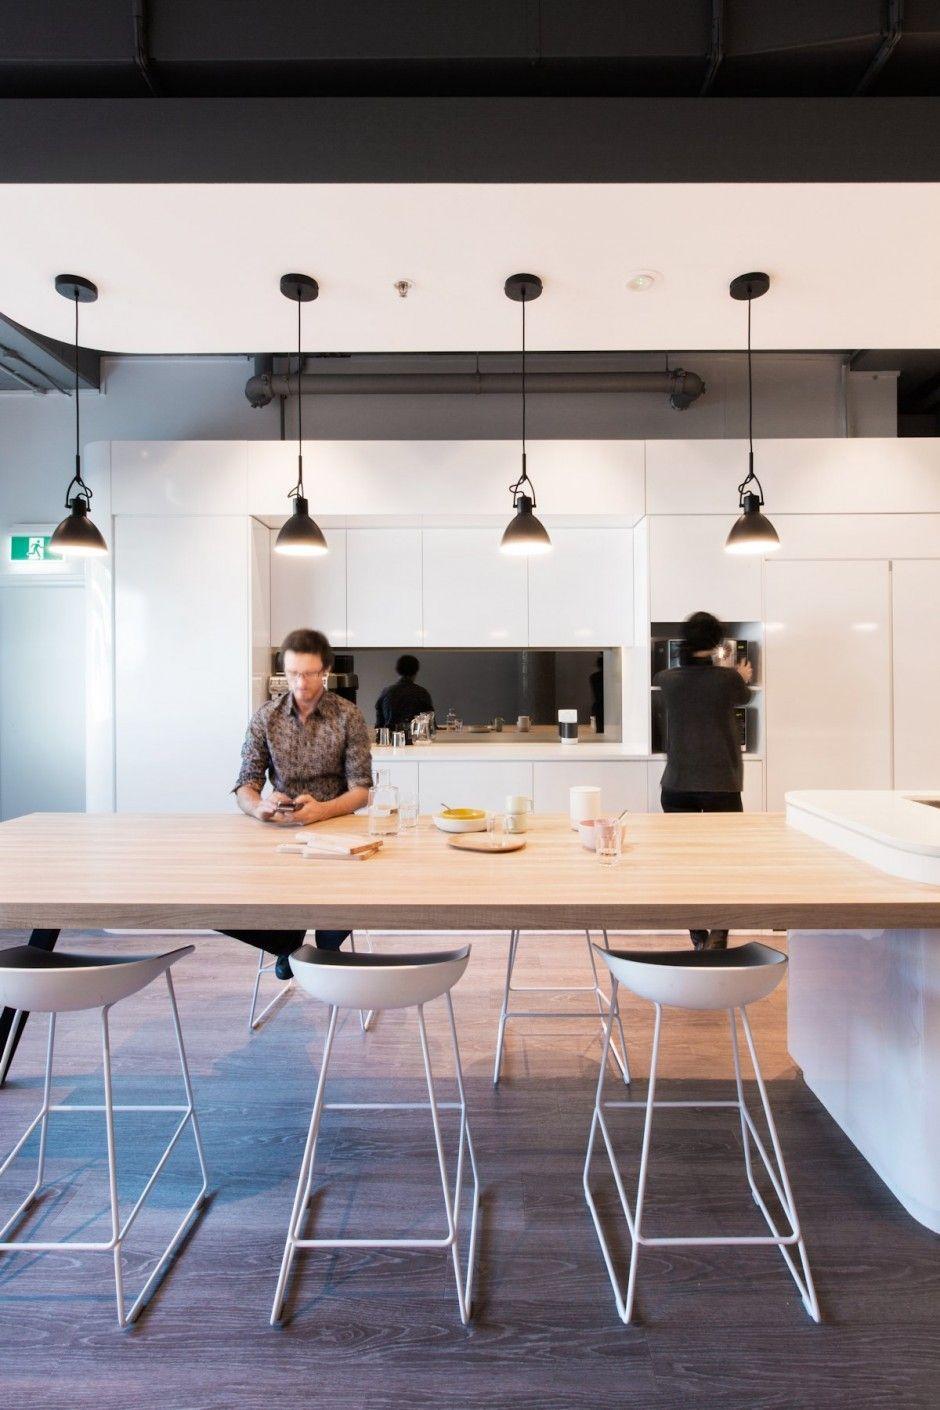 Zimmer Head Office By: Gray Puksand | Break Room | Pinterest | Gray ...